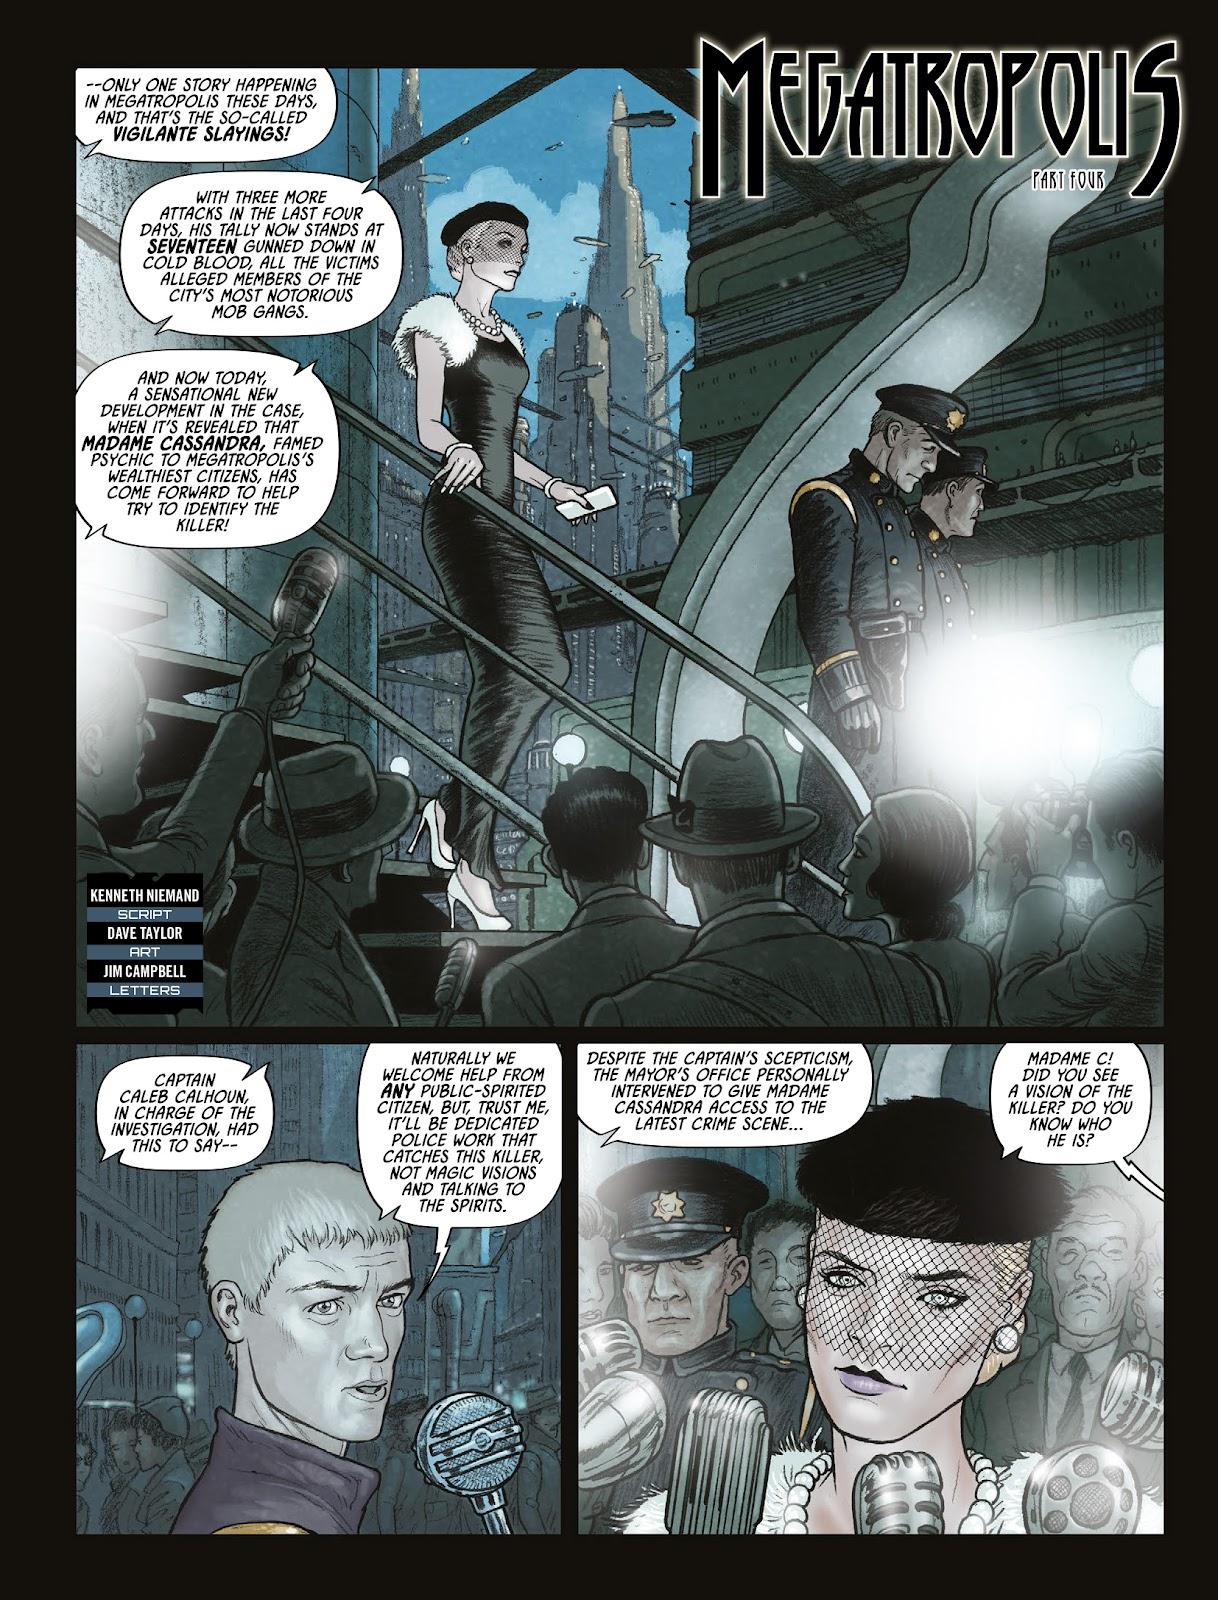 Judge Dredd Megazine (Vol. 5) issue 427 - Page 16